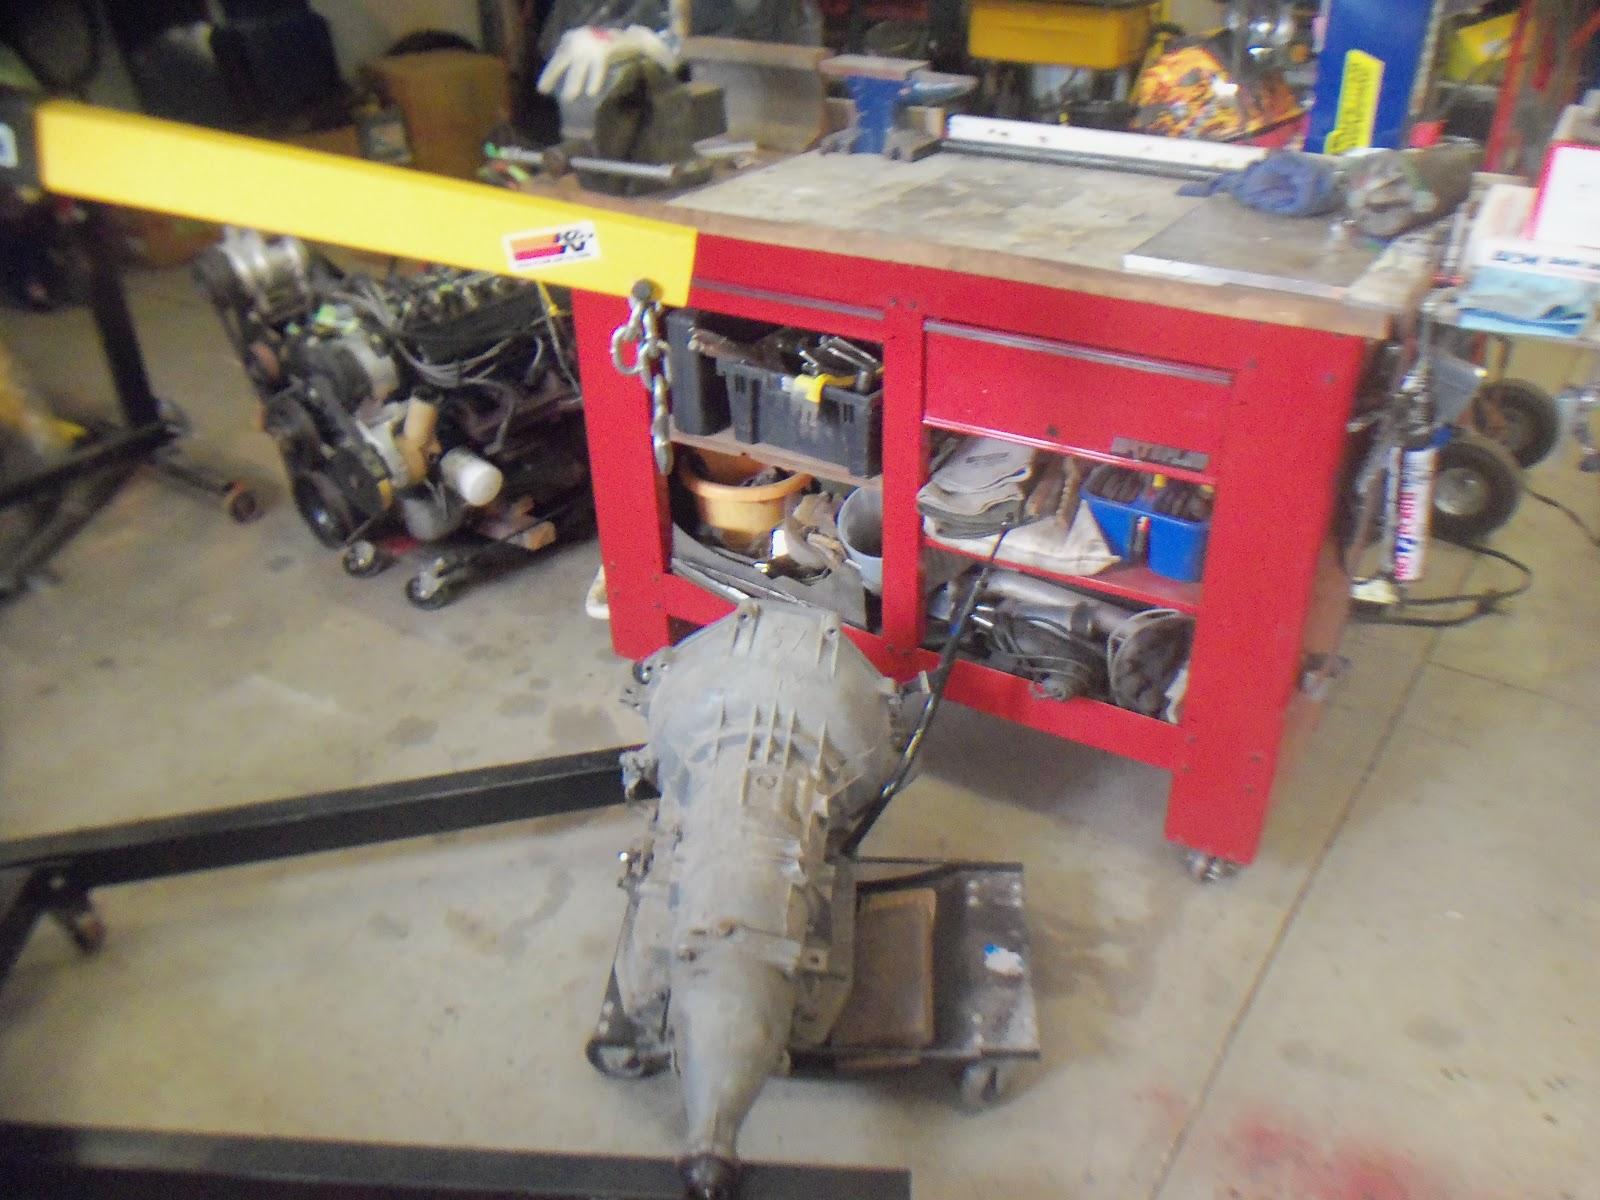 E Tek Restorations Classics Rods And Customs Bm Shift Kit Ford Aod Transmission Up Onto The Bench